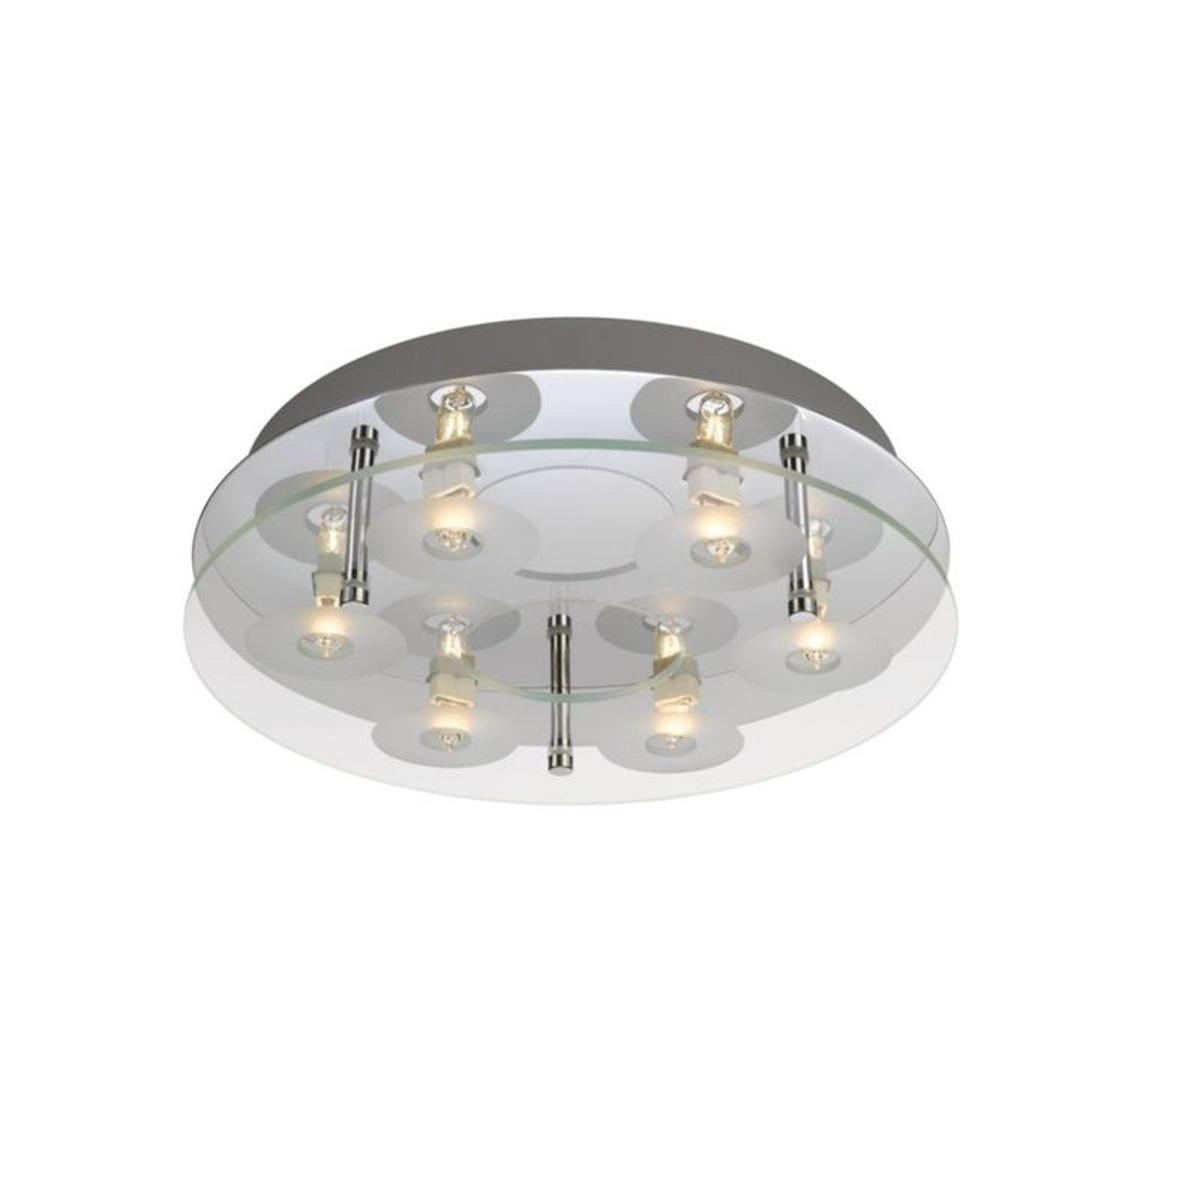 Philips - 307421110 - Plafonier Astrid Ceiling Lamp